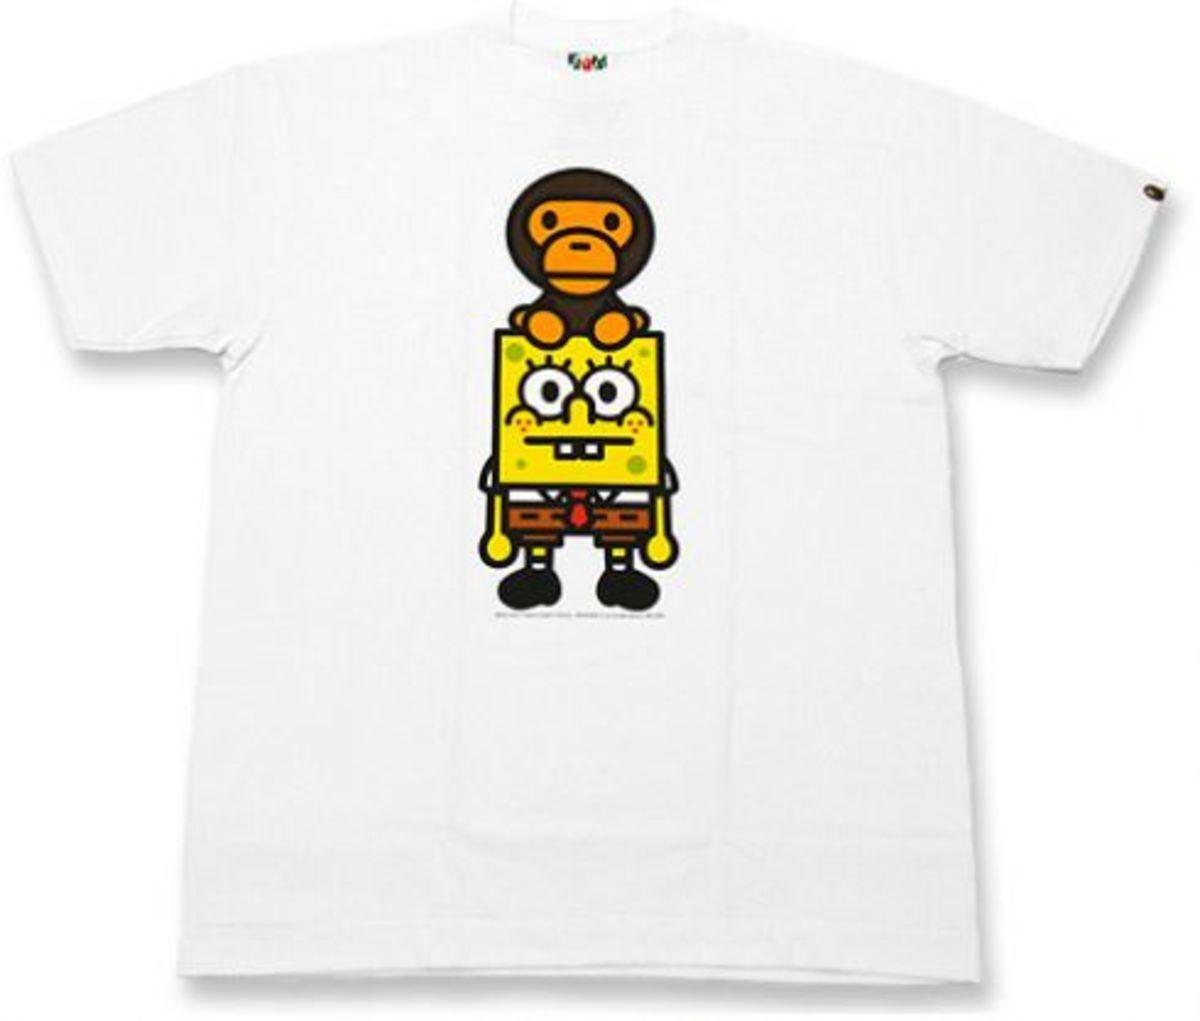 3292d3d3 BAPE x SpongeBob - New Baby Milo T-Shirt | Ideas for the house ...